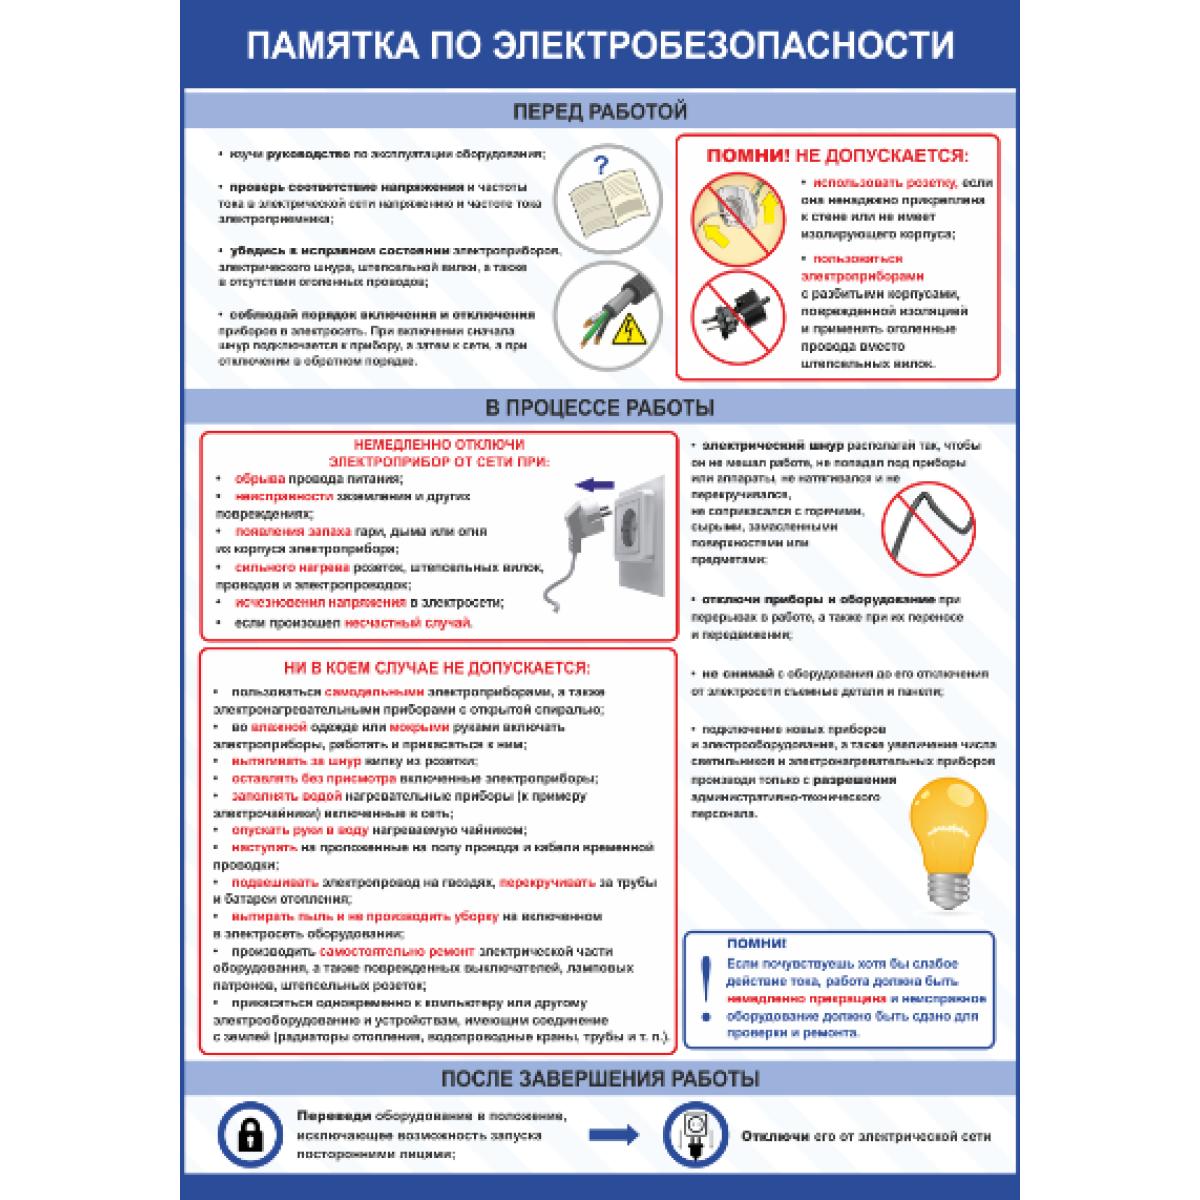 2611 Плакат по охране труда  Памятка по электробезопасности